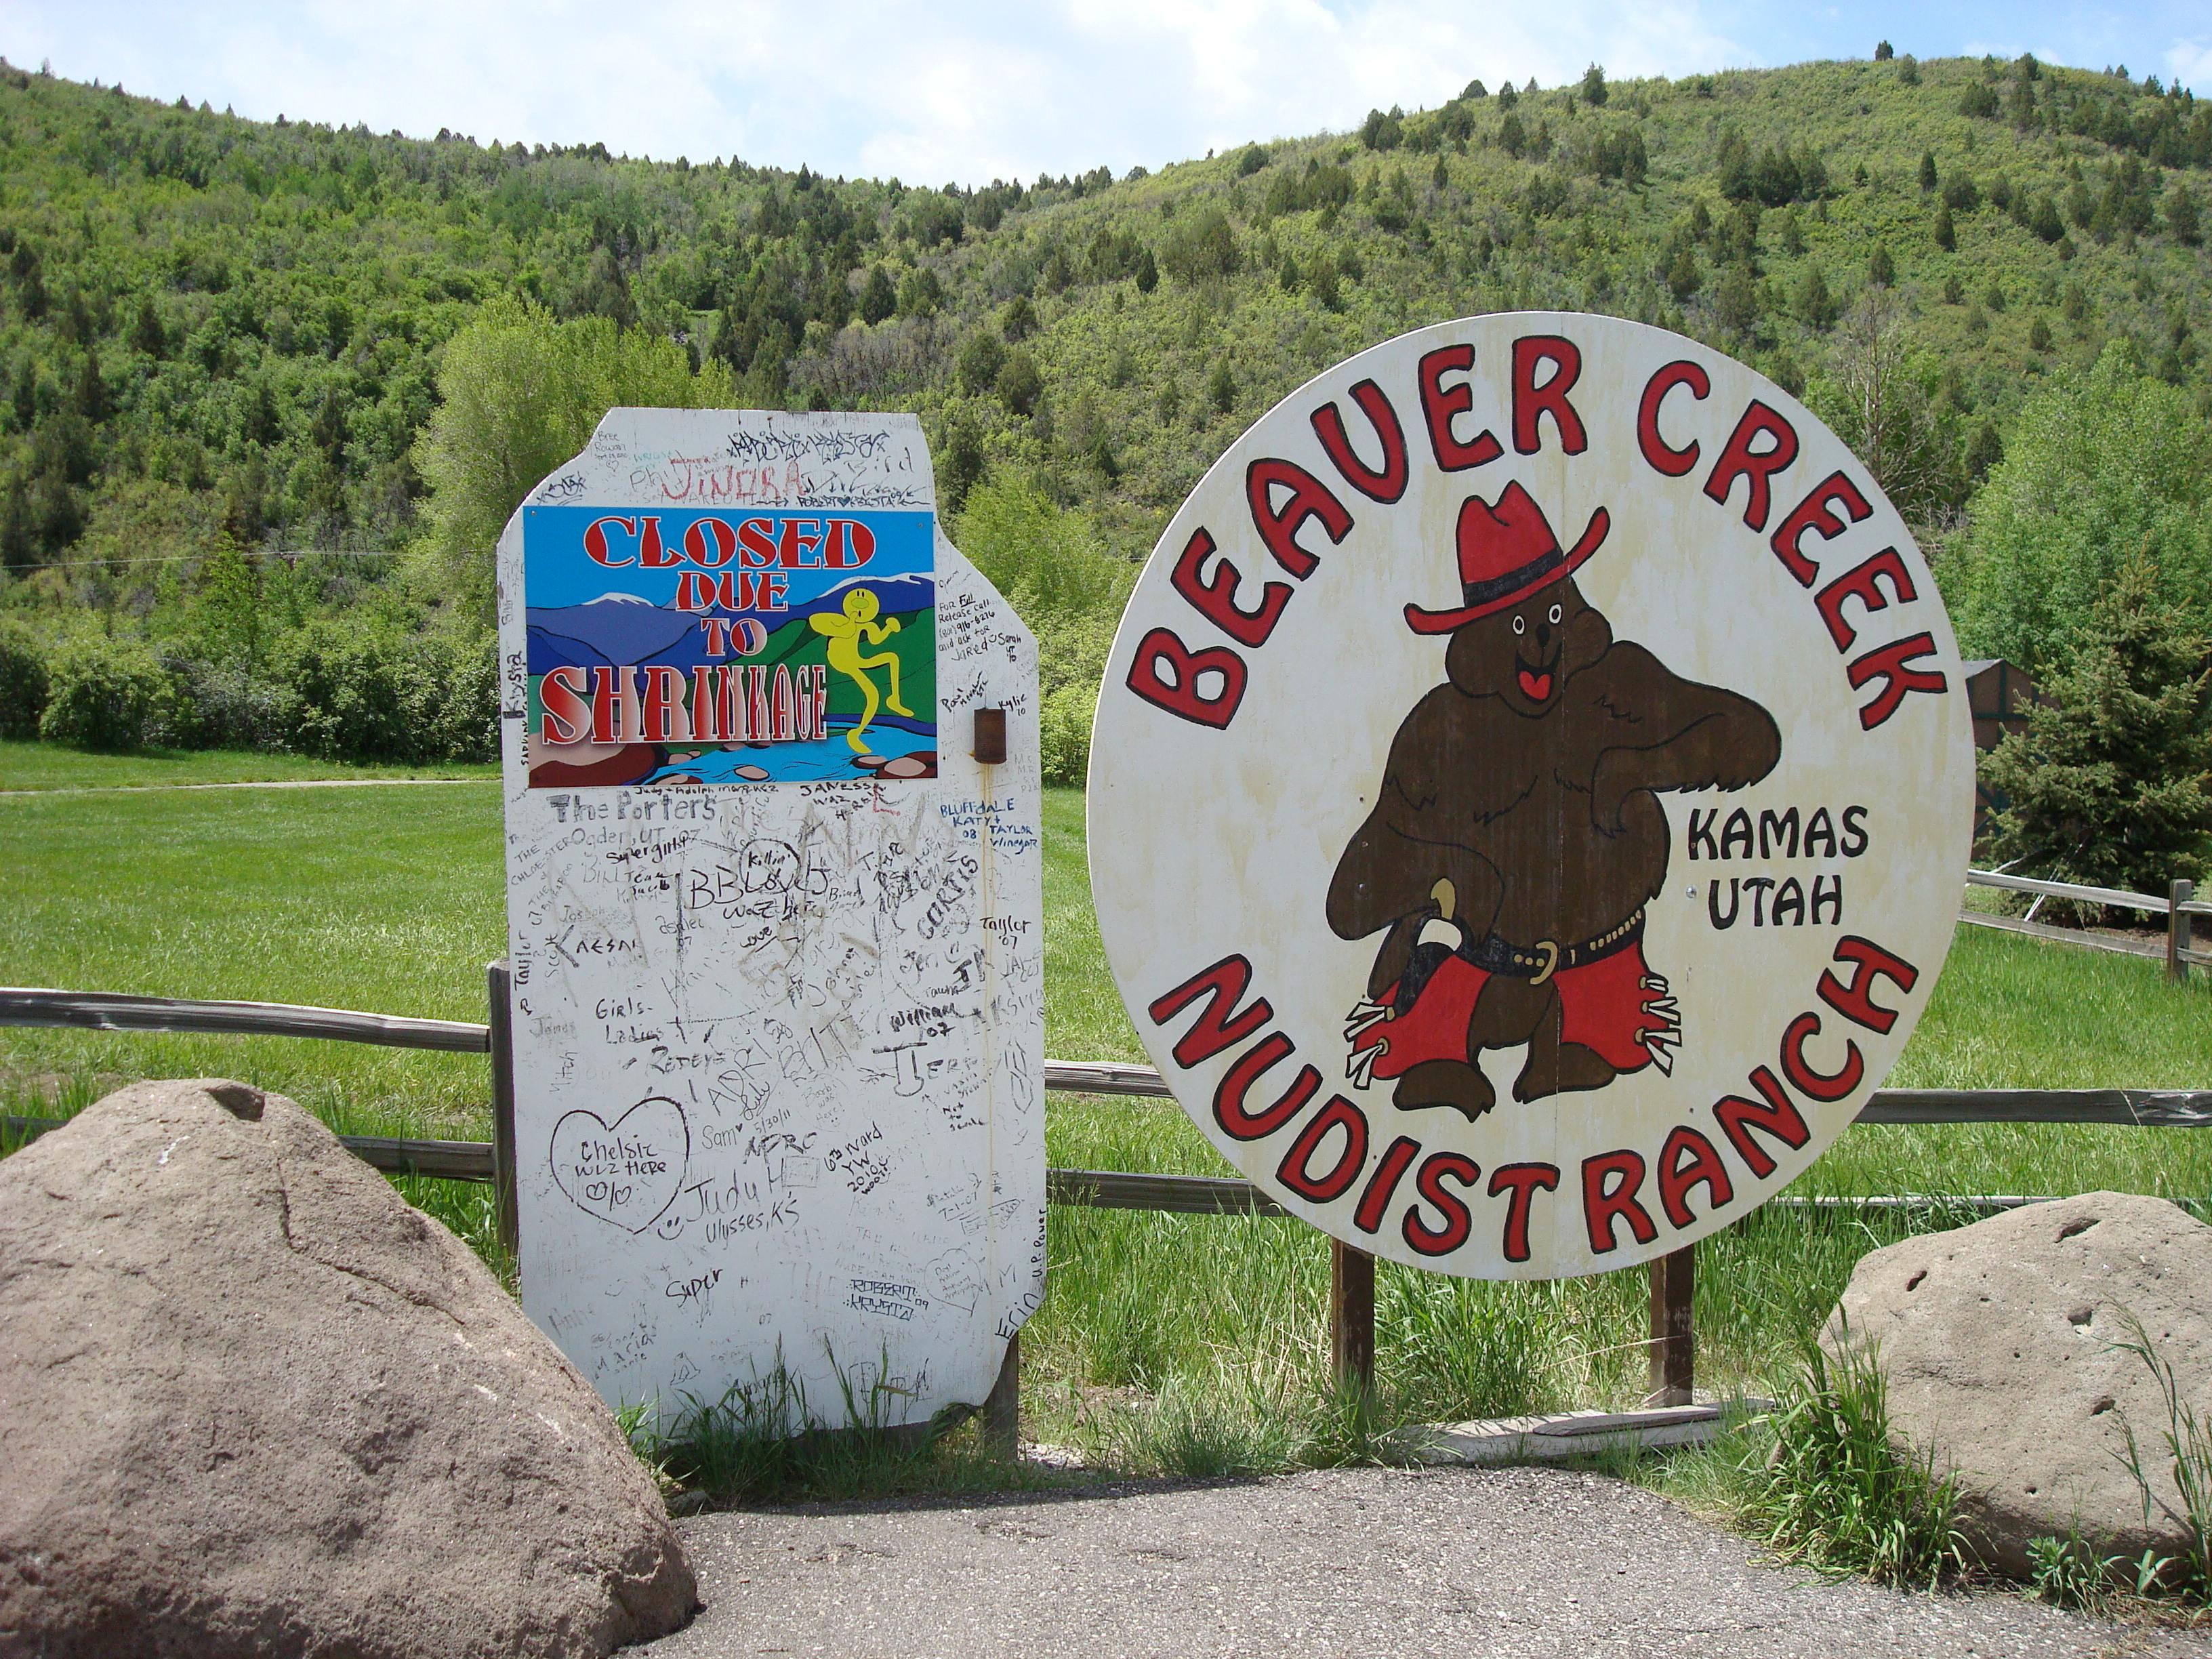 Firmly convinced, Beaver creek nudist ranch theme